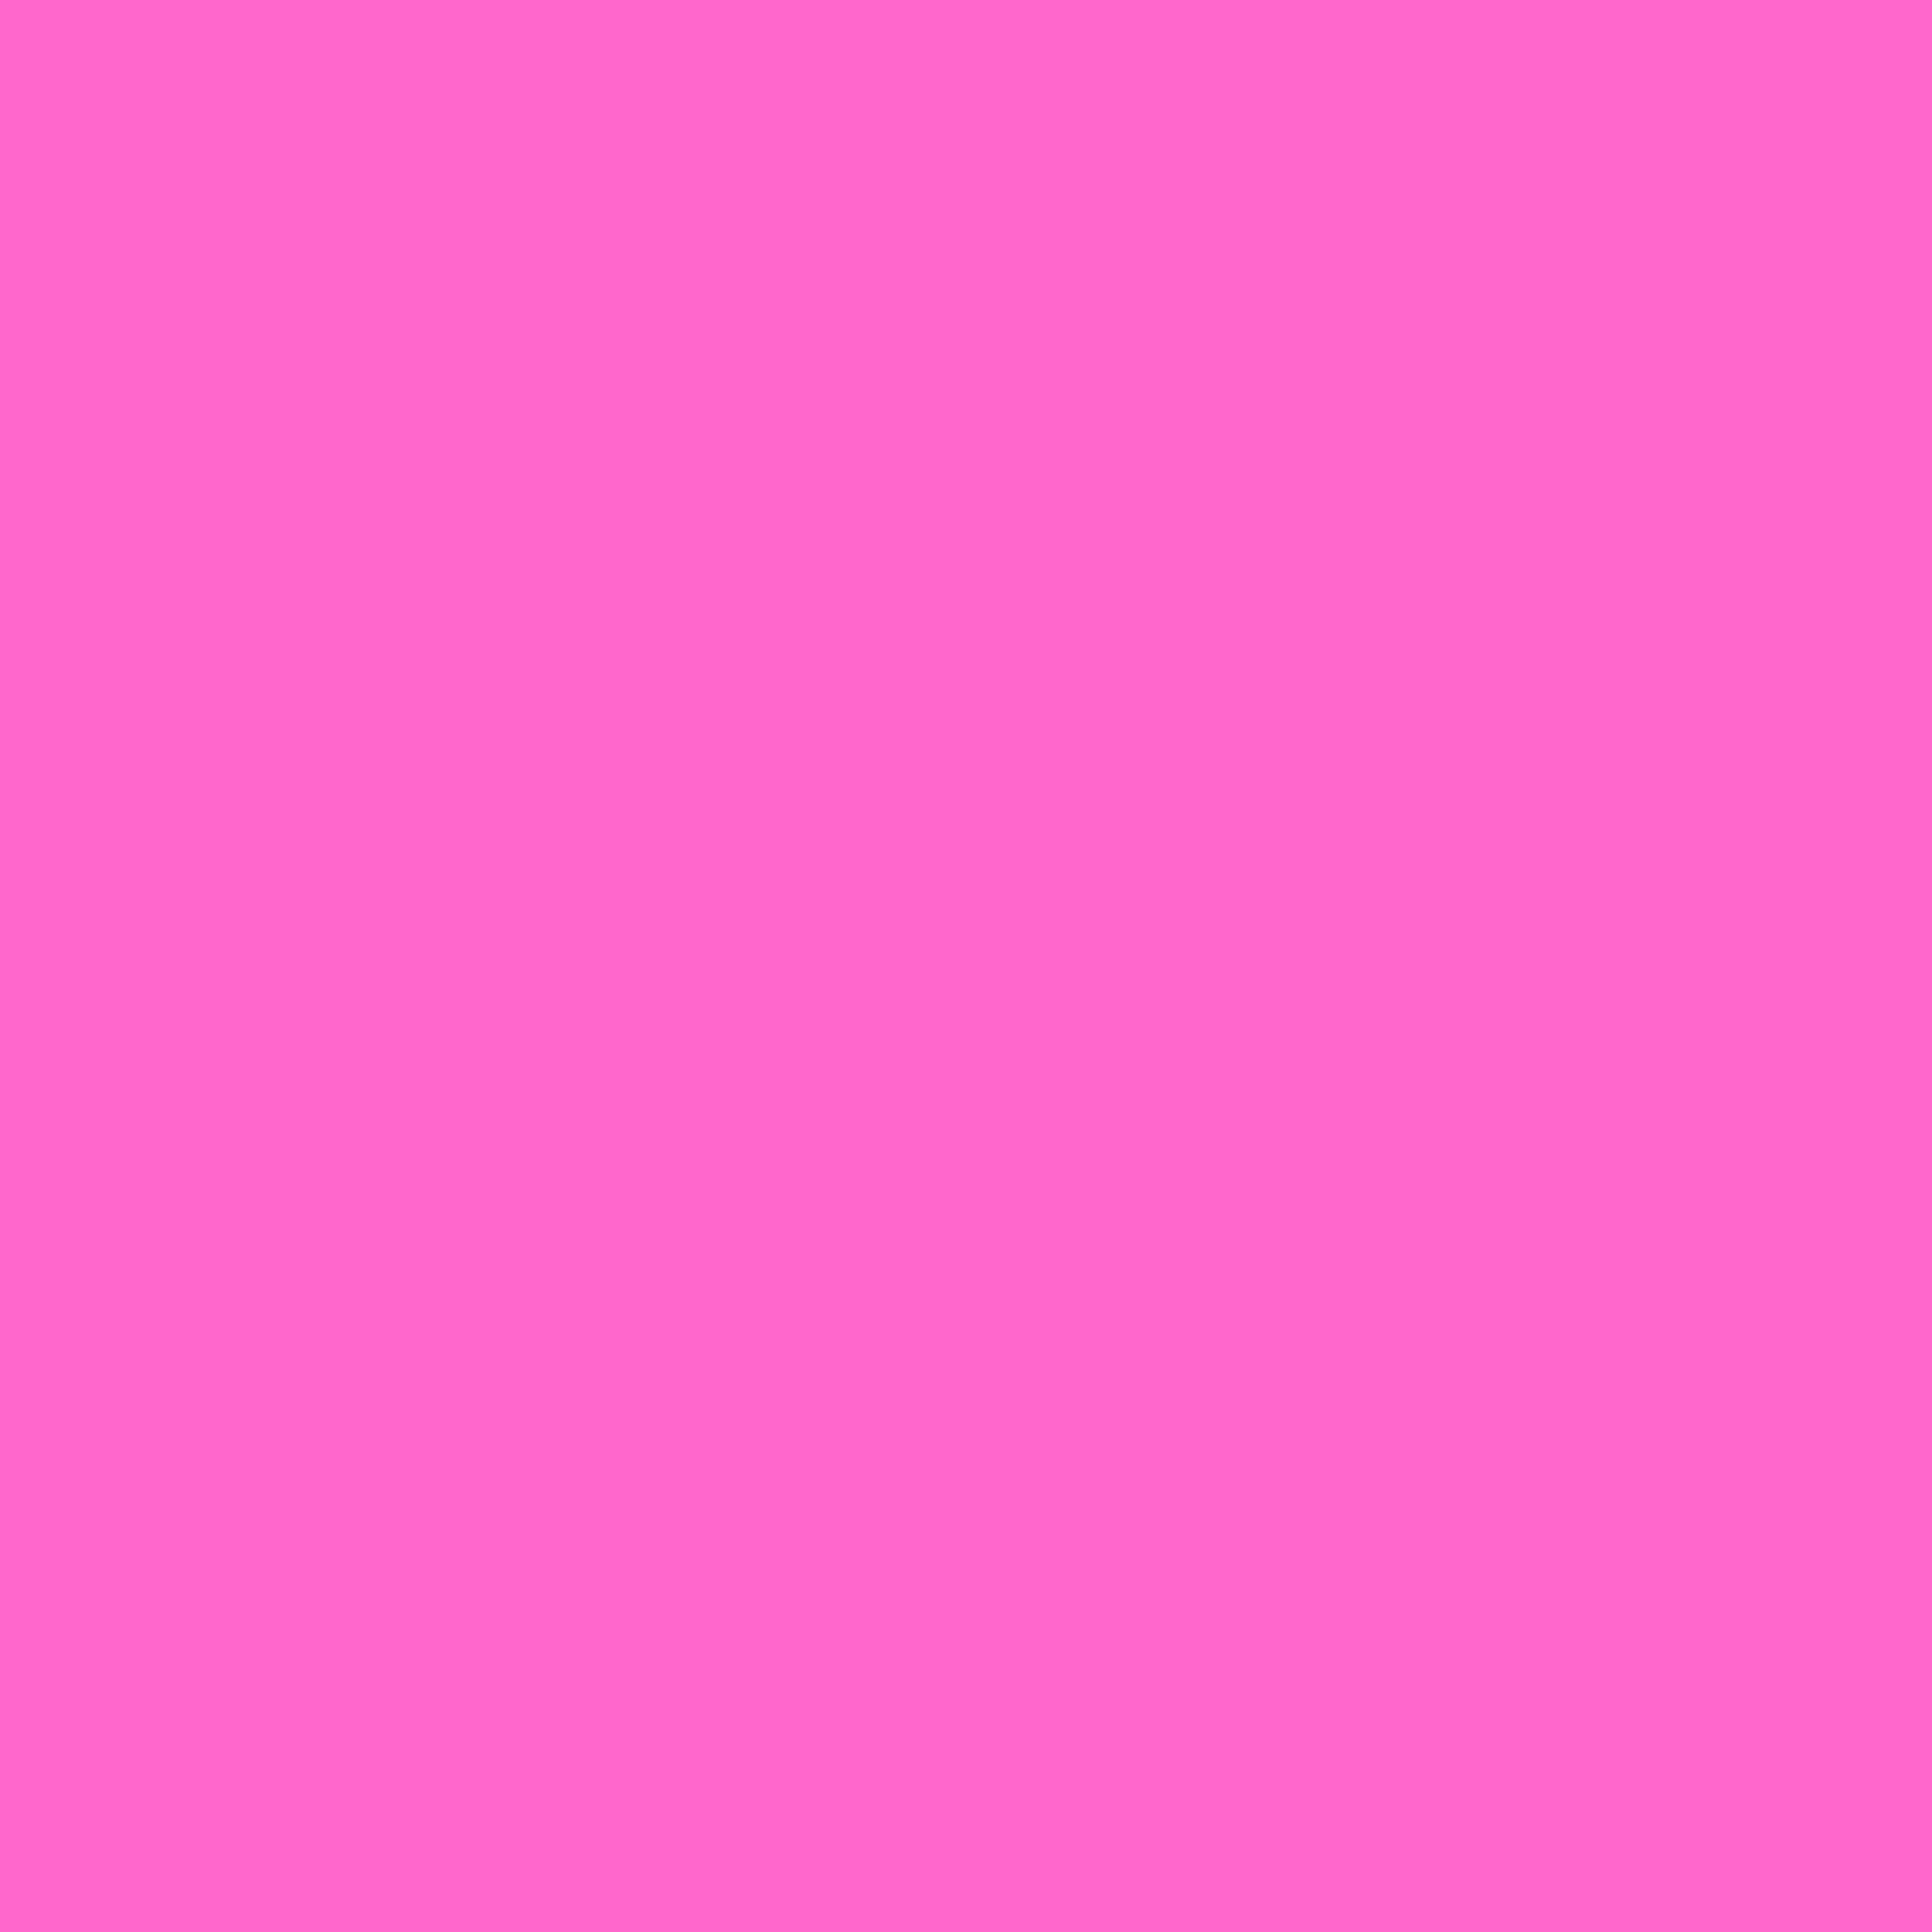 3600x3600 Rose Pink Solid Color Background